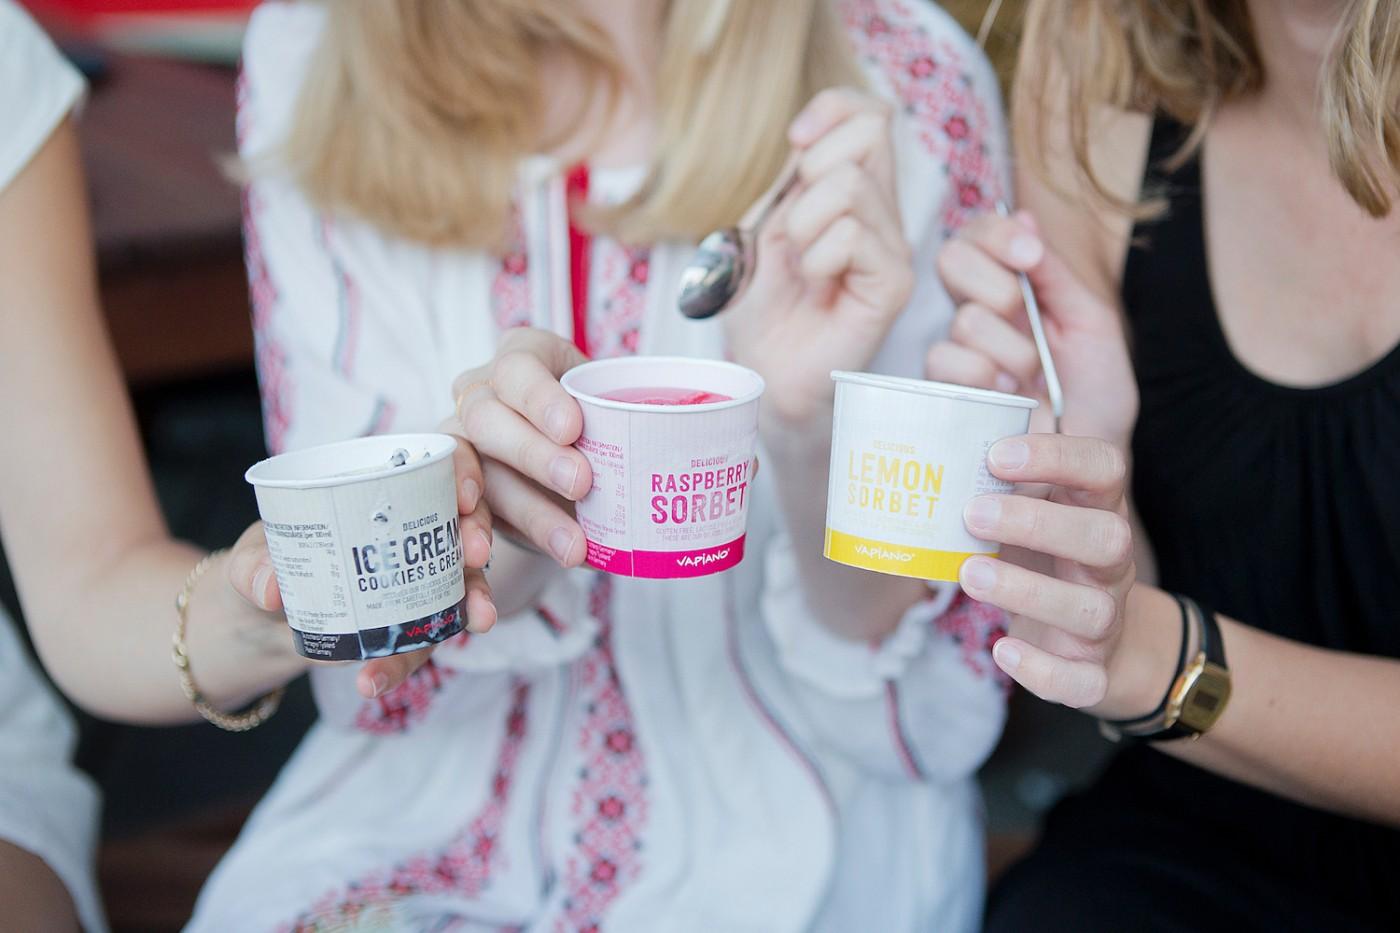 vapiano ice cream _ vapiano zuckerfrei _ vapiano sorbet _ vapiano münchen _ restaurants münchen